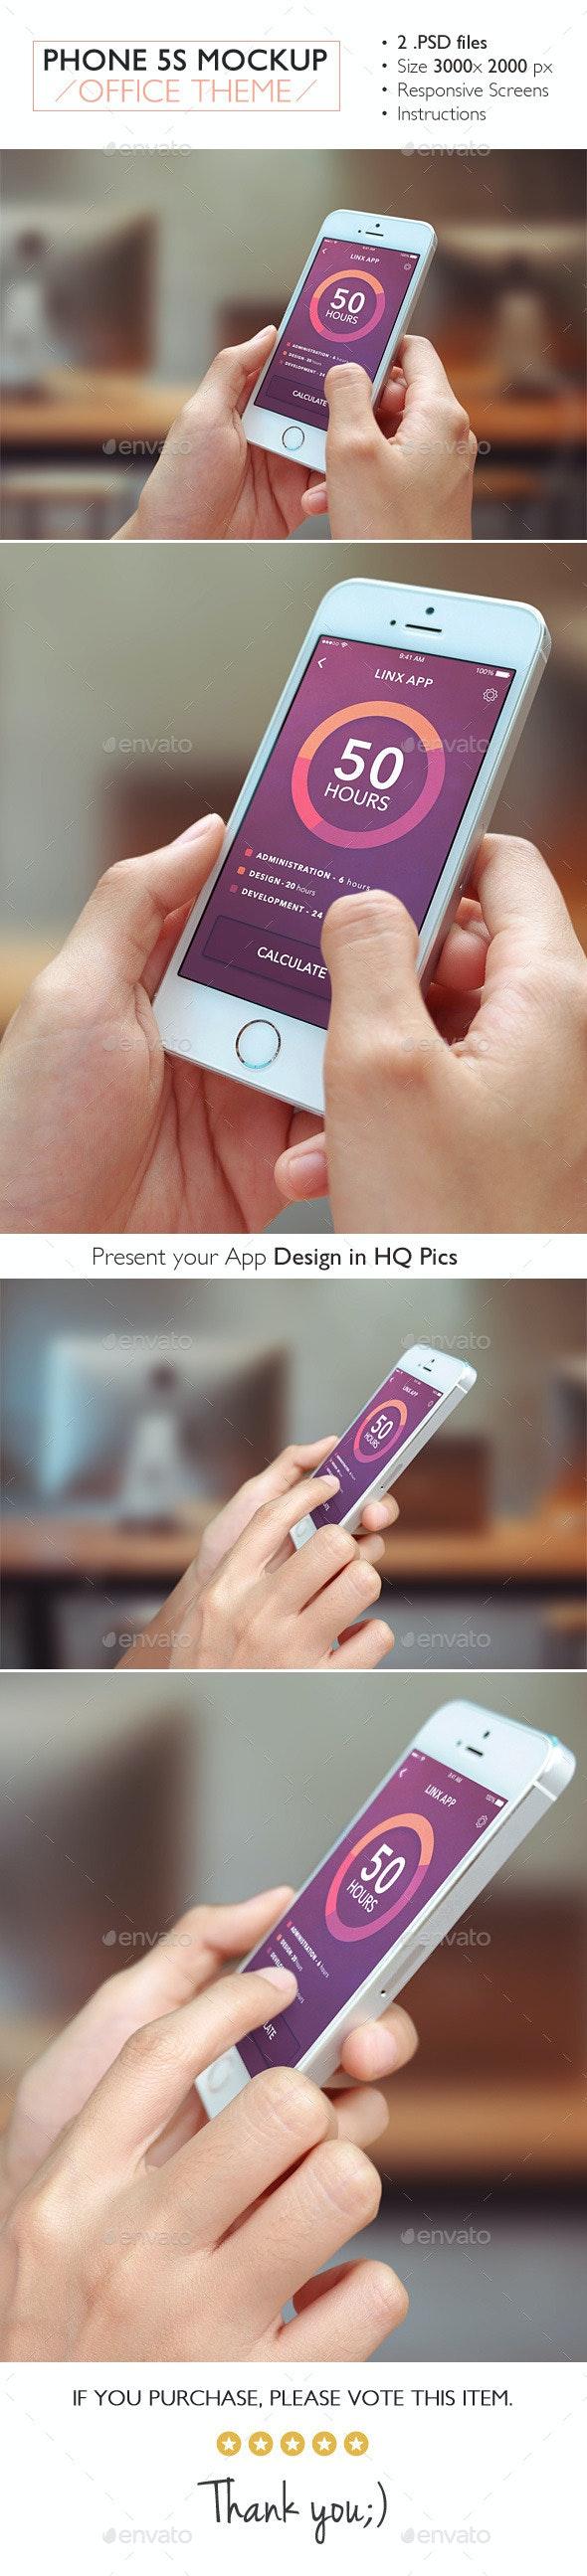 Phone 5s Mockup Office Theme - Product Mock-Ups Graphics